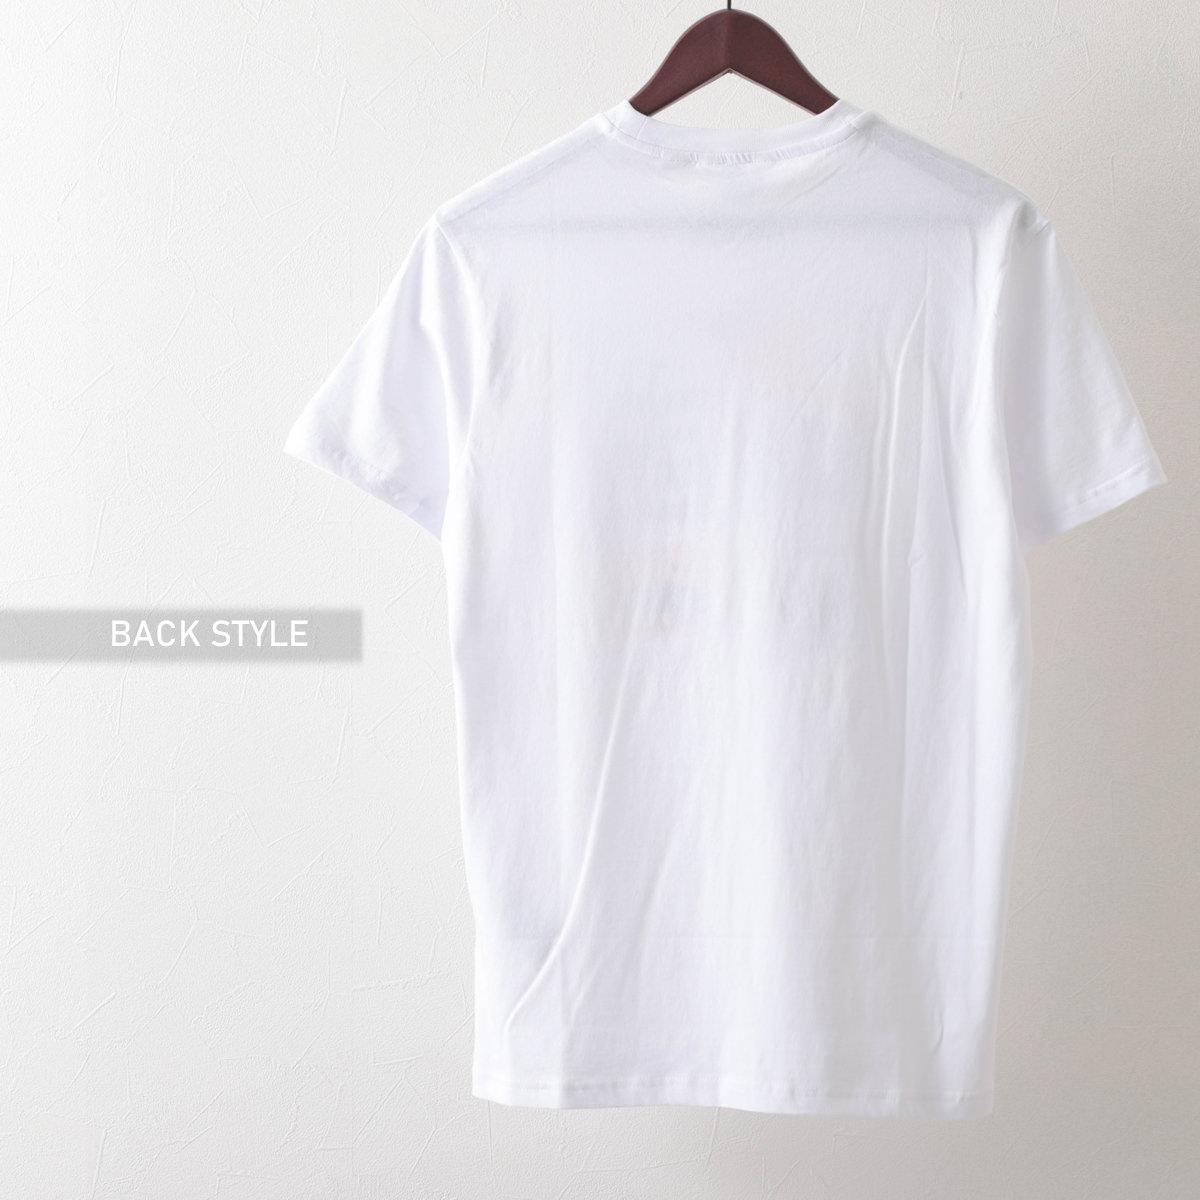 Ben Sherman ベンシャーマン メンズ Tシャツ ロストテーププリント 2色 マリン ホワイト オーガニックコットン レギュラーフィット